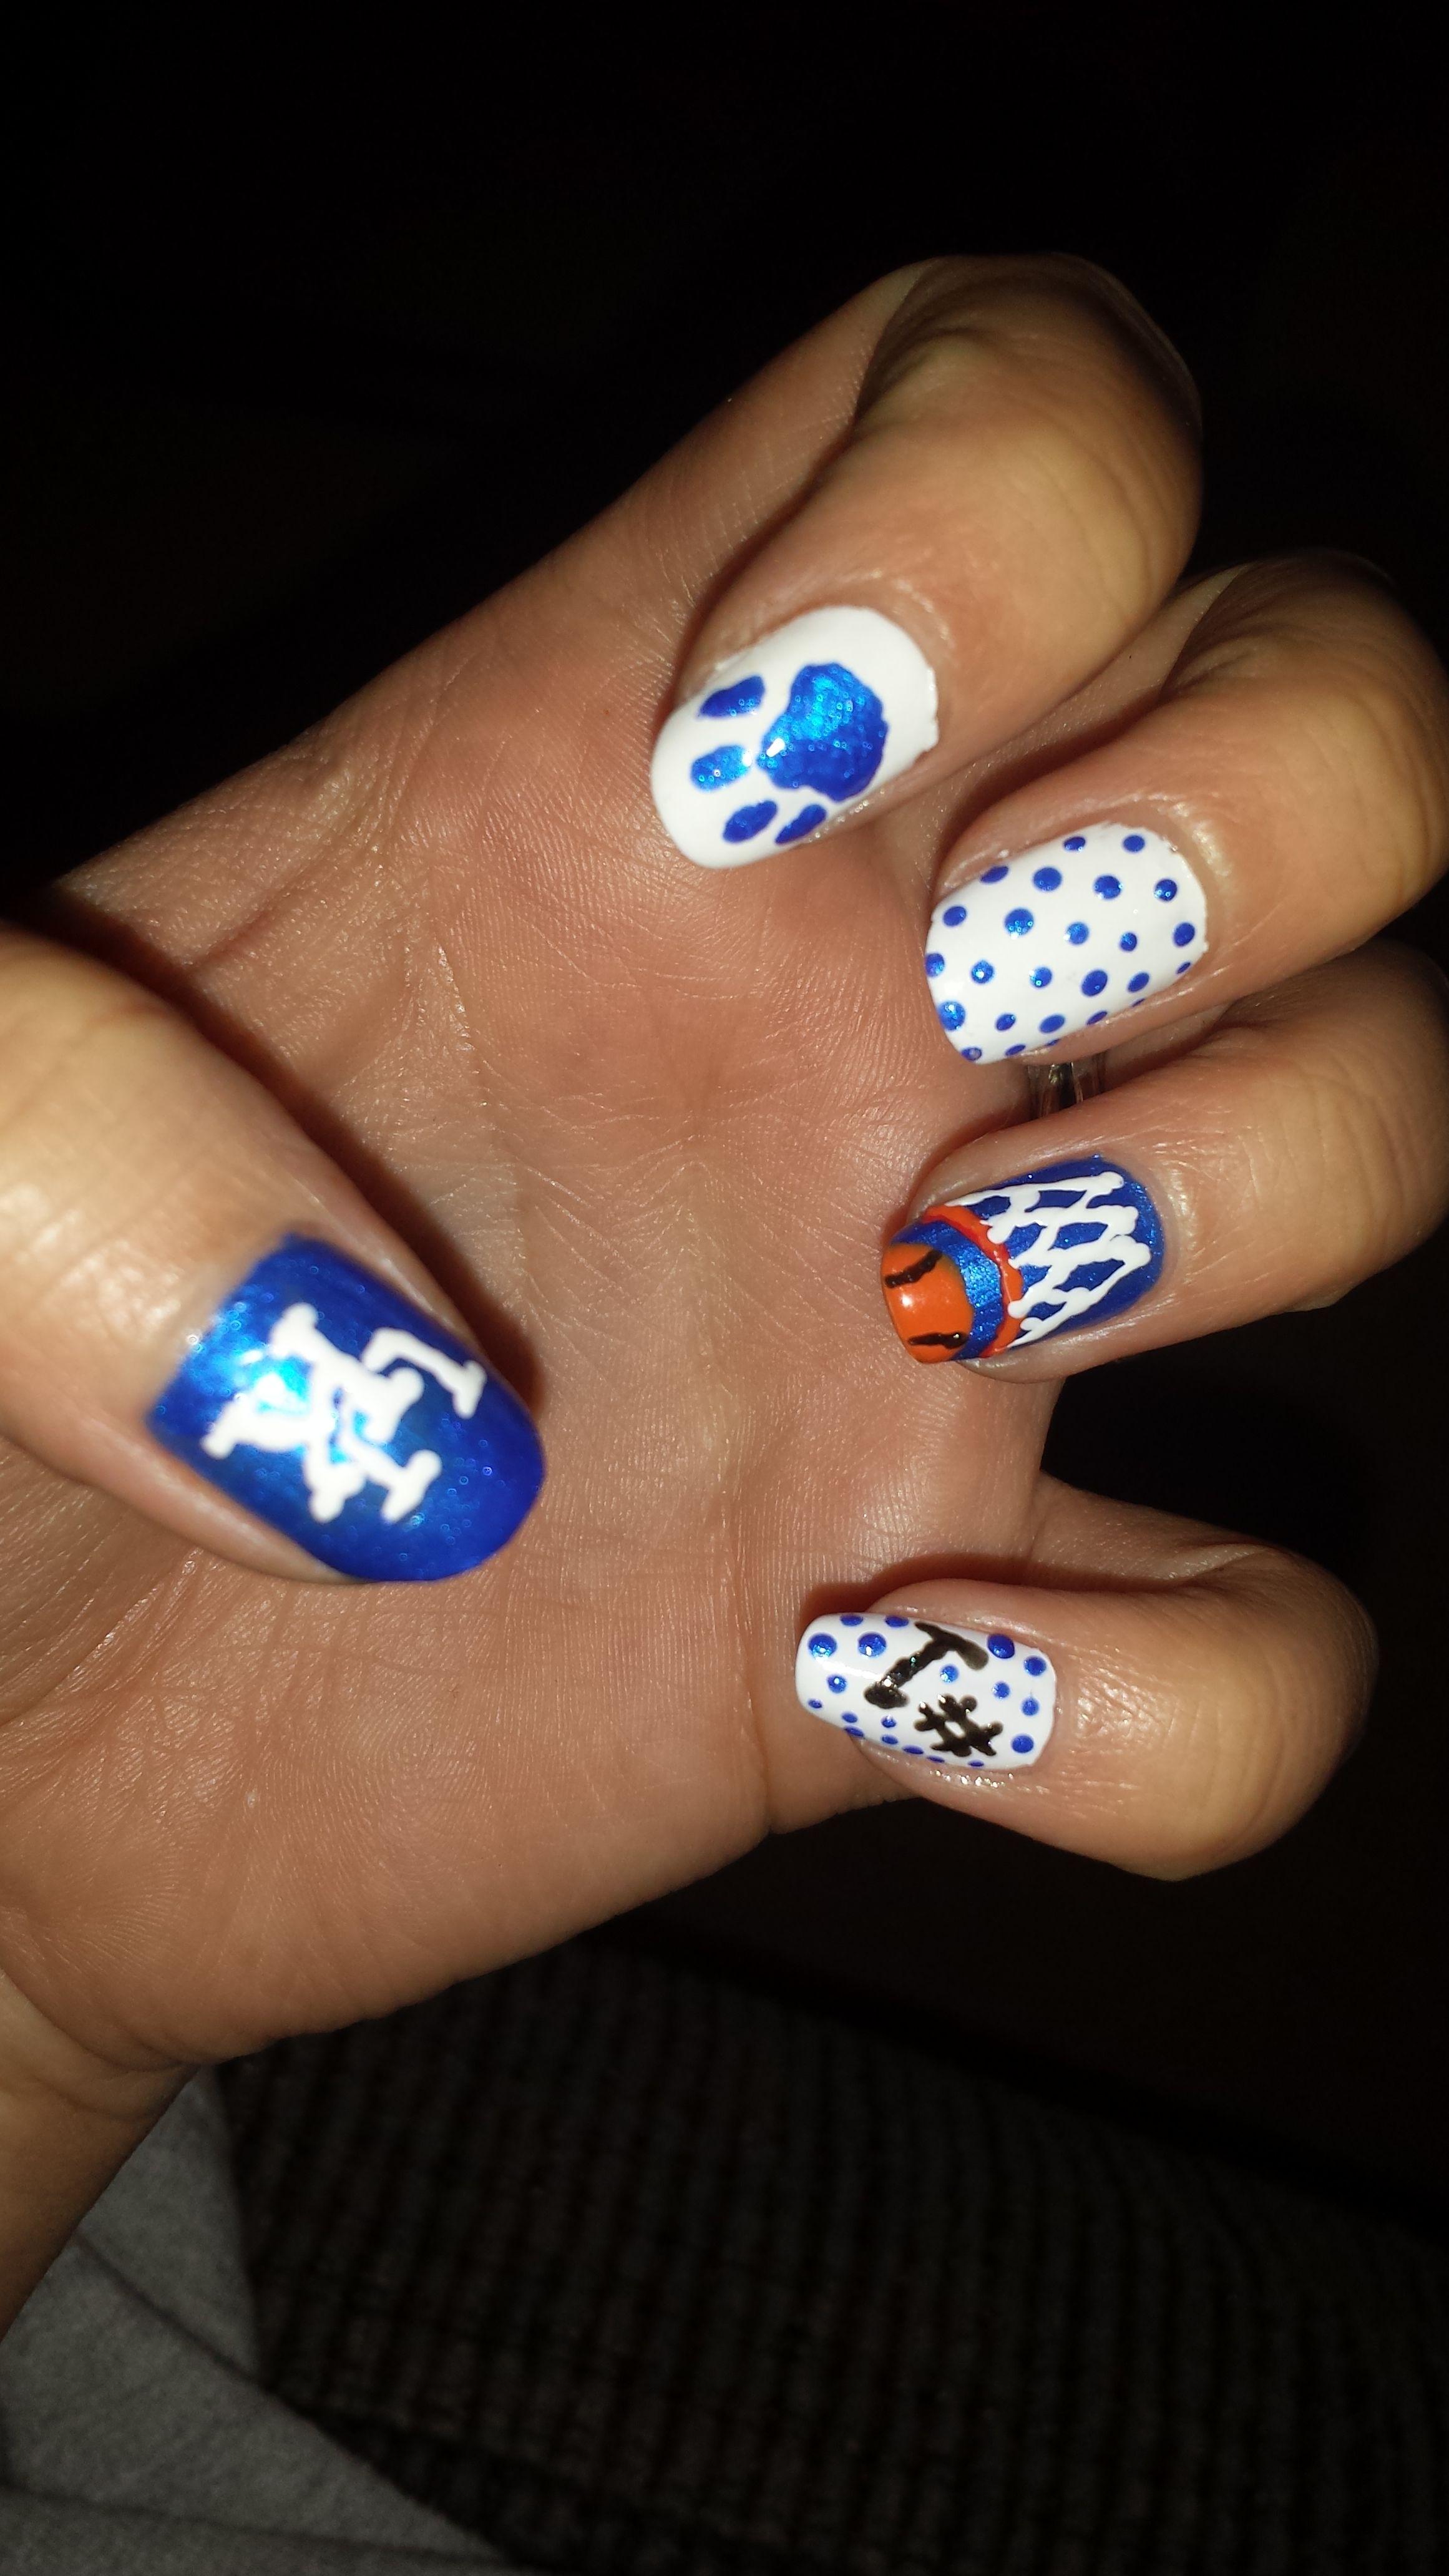 Uk Wildcat nail art :)